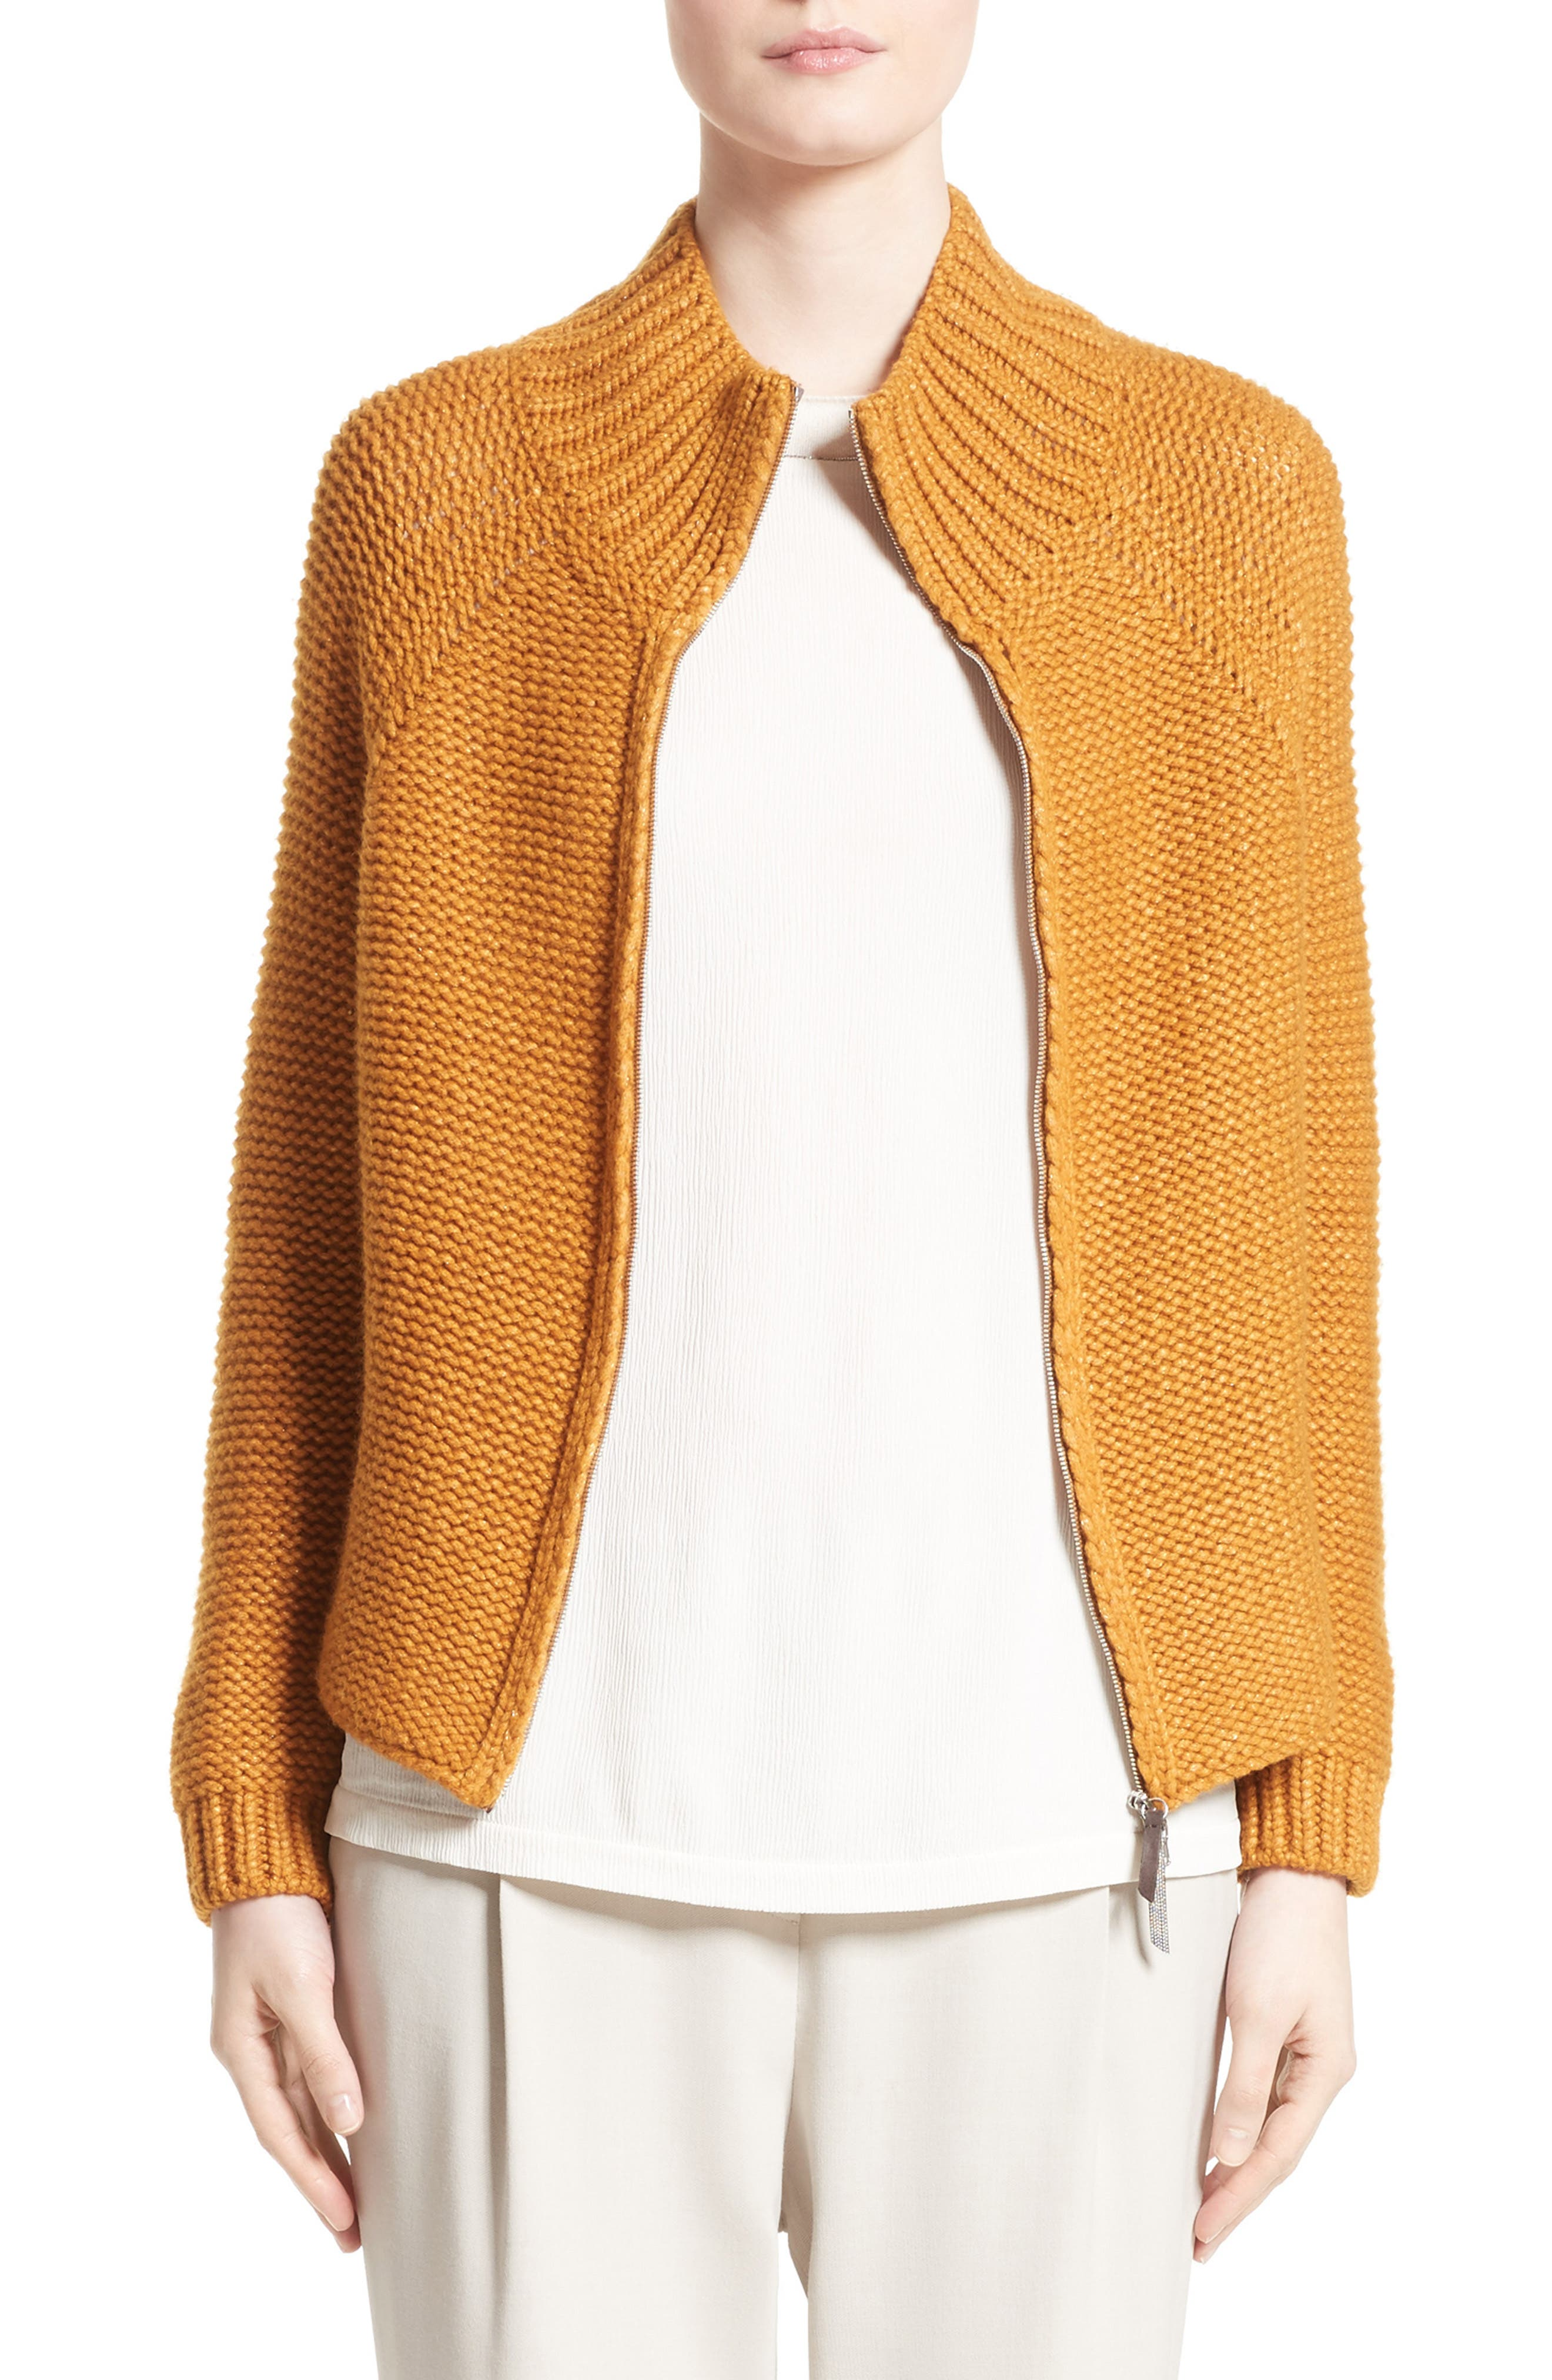 Alternate Image 1 Selected - Fabiana Filippi Knit Wool Blend Cardigan